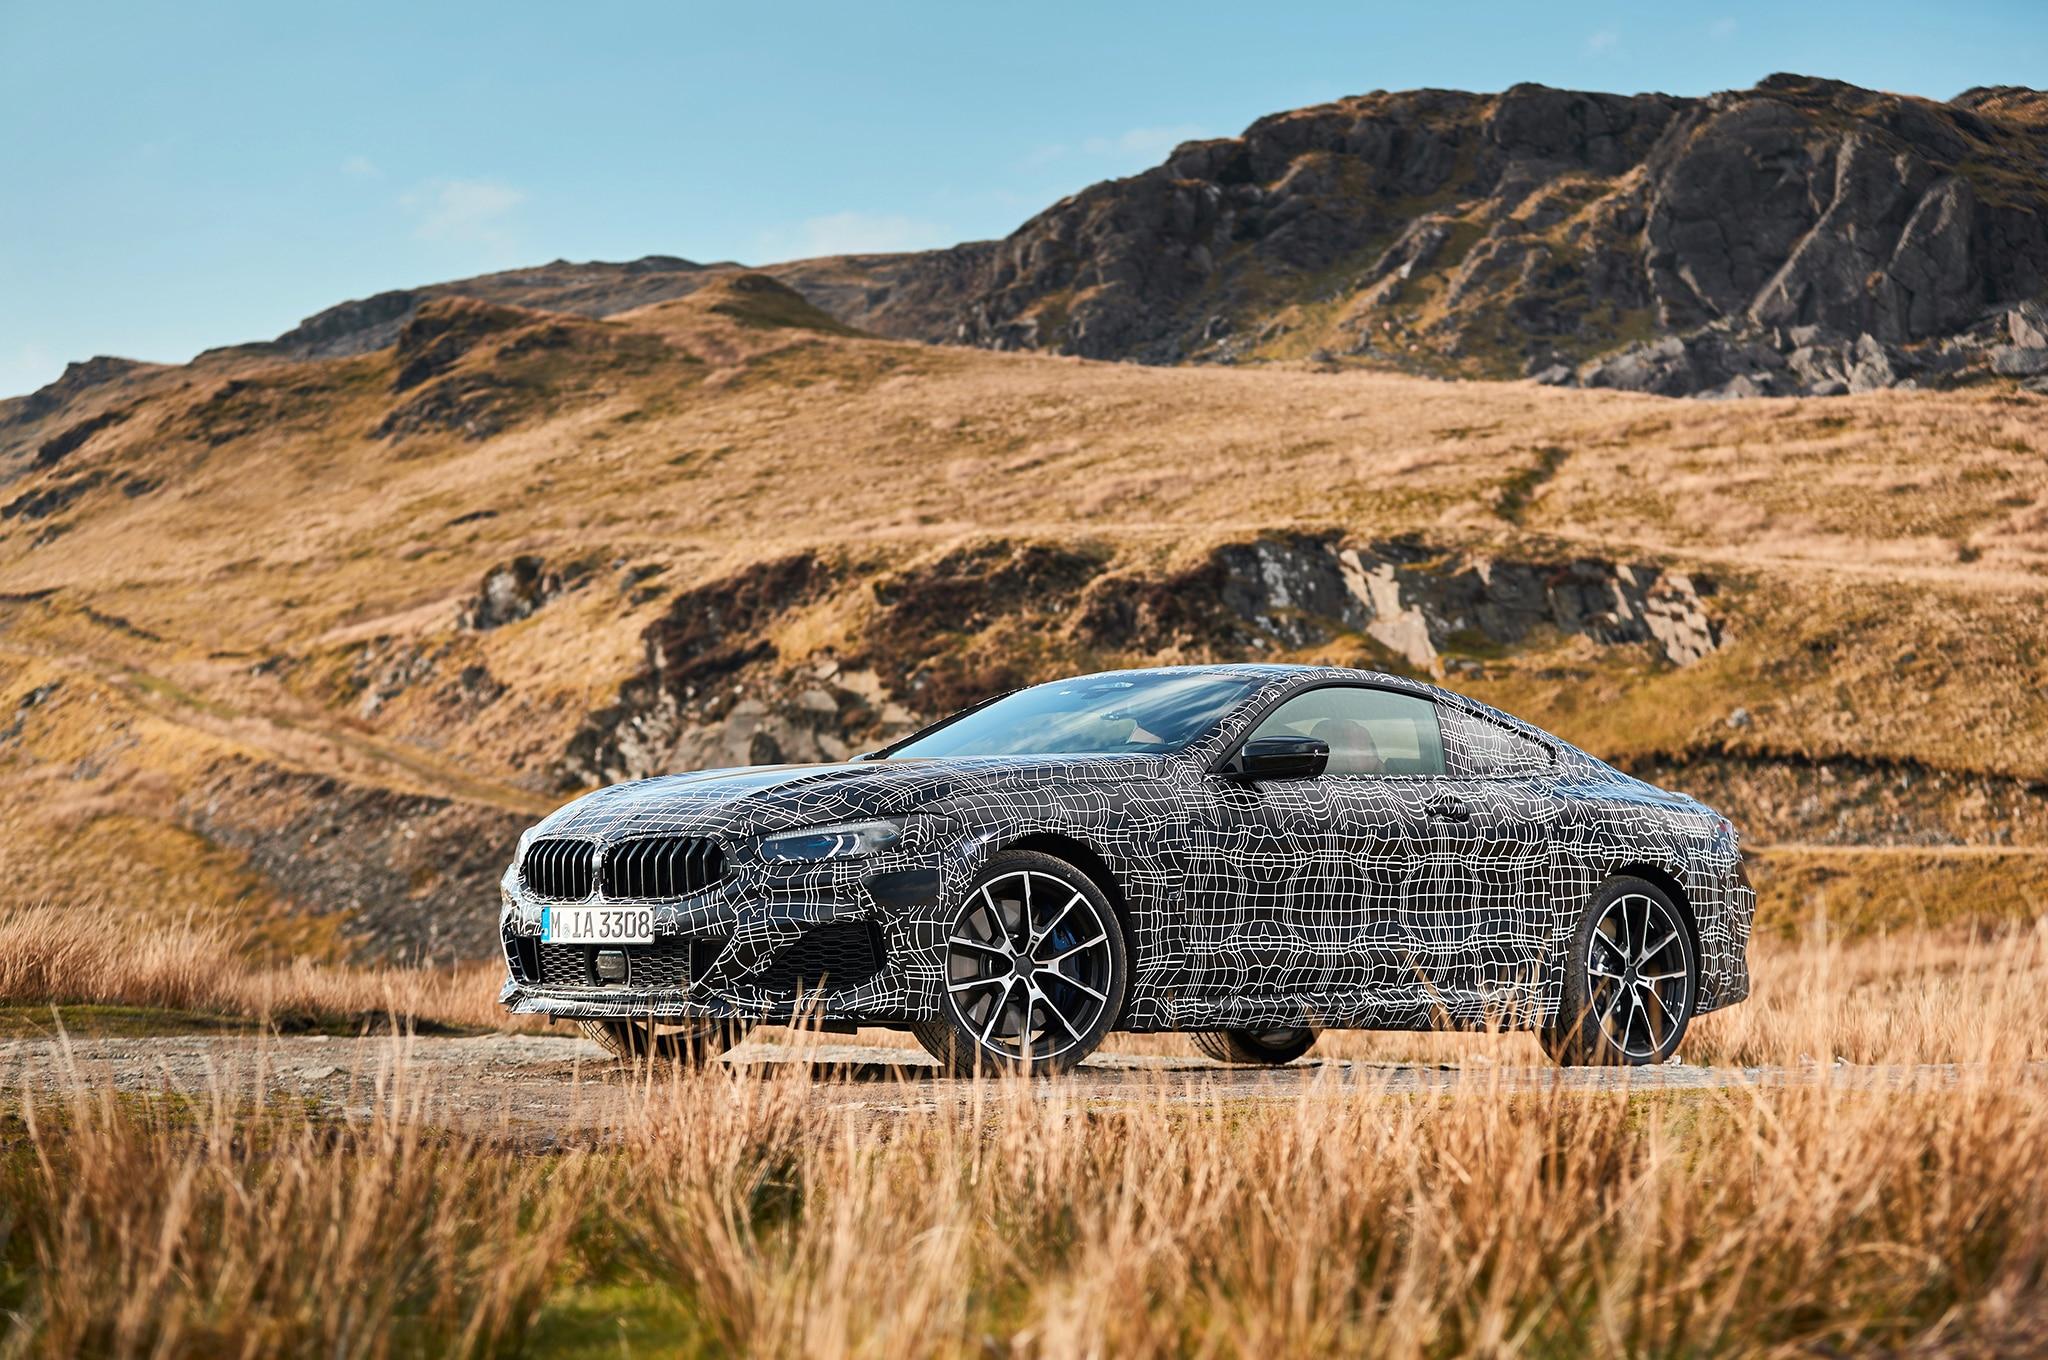 2019 Bmw 850i Xdrive Prototype Drive Automobile Magazine Engine Wiring Harness Show More